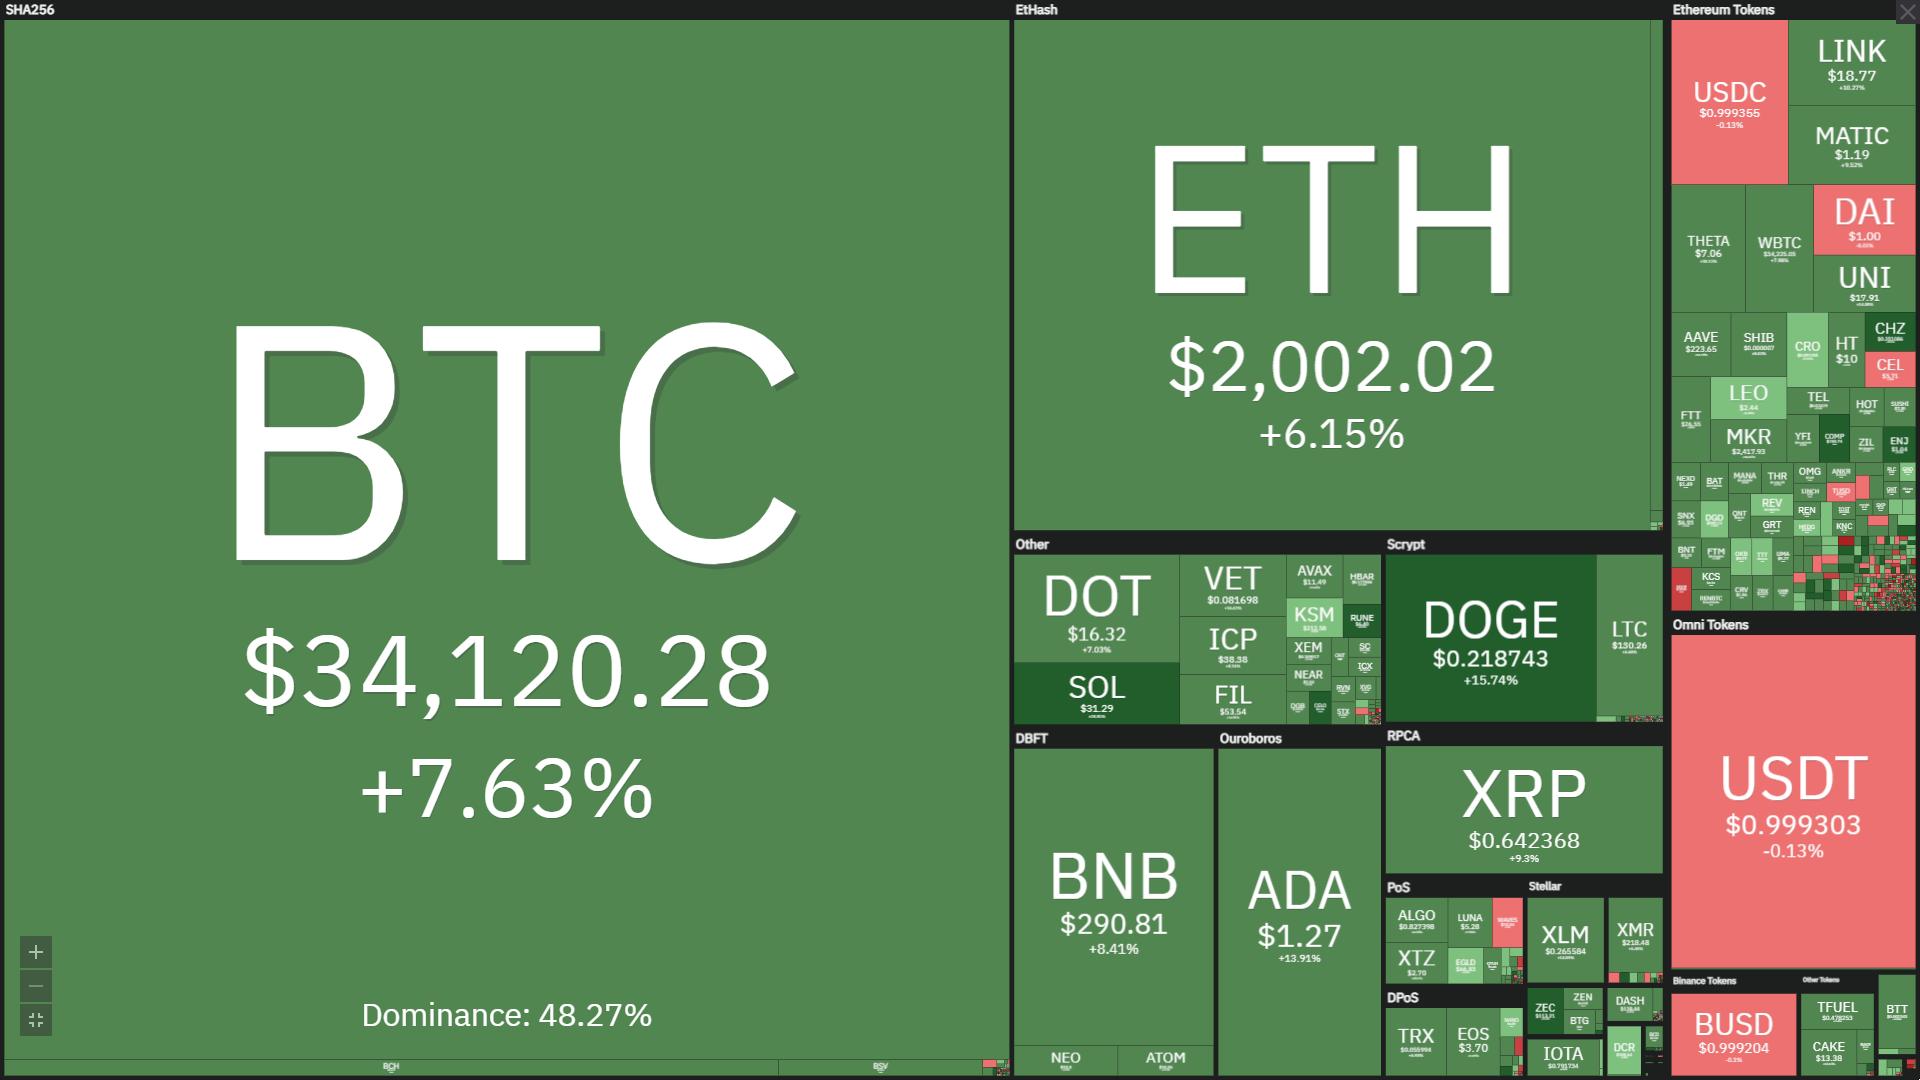 Panoramica dei mercati crypto. Fonte: Coin360